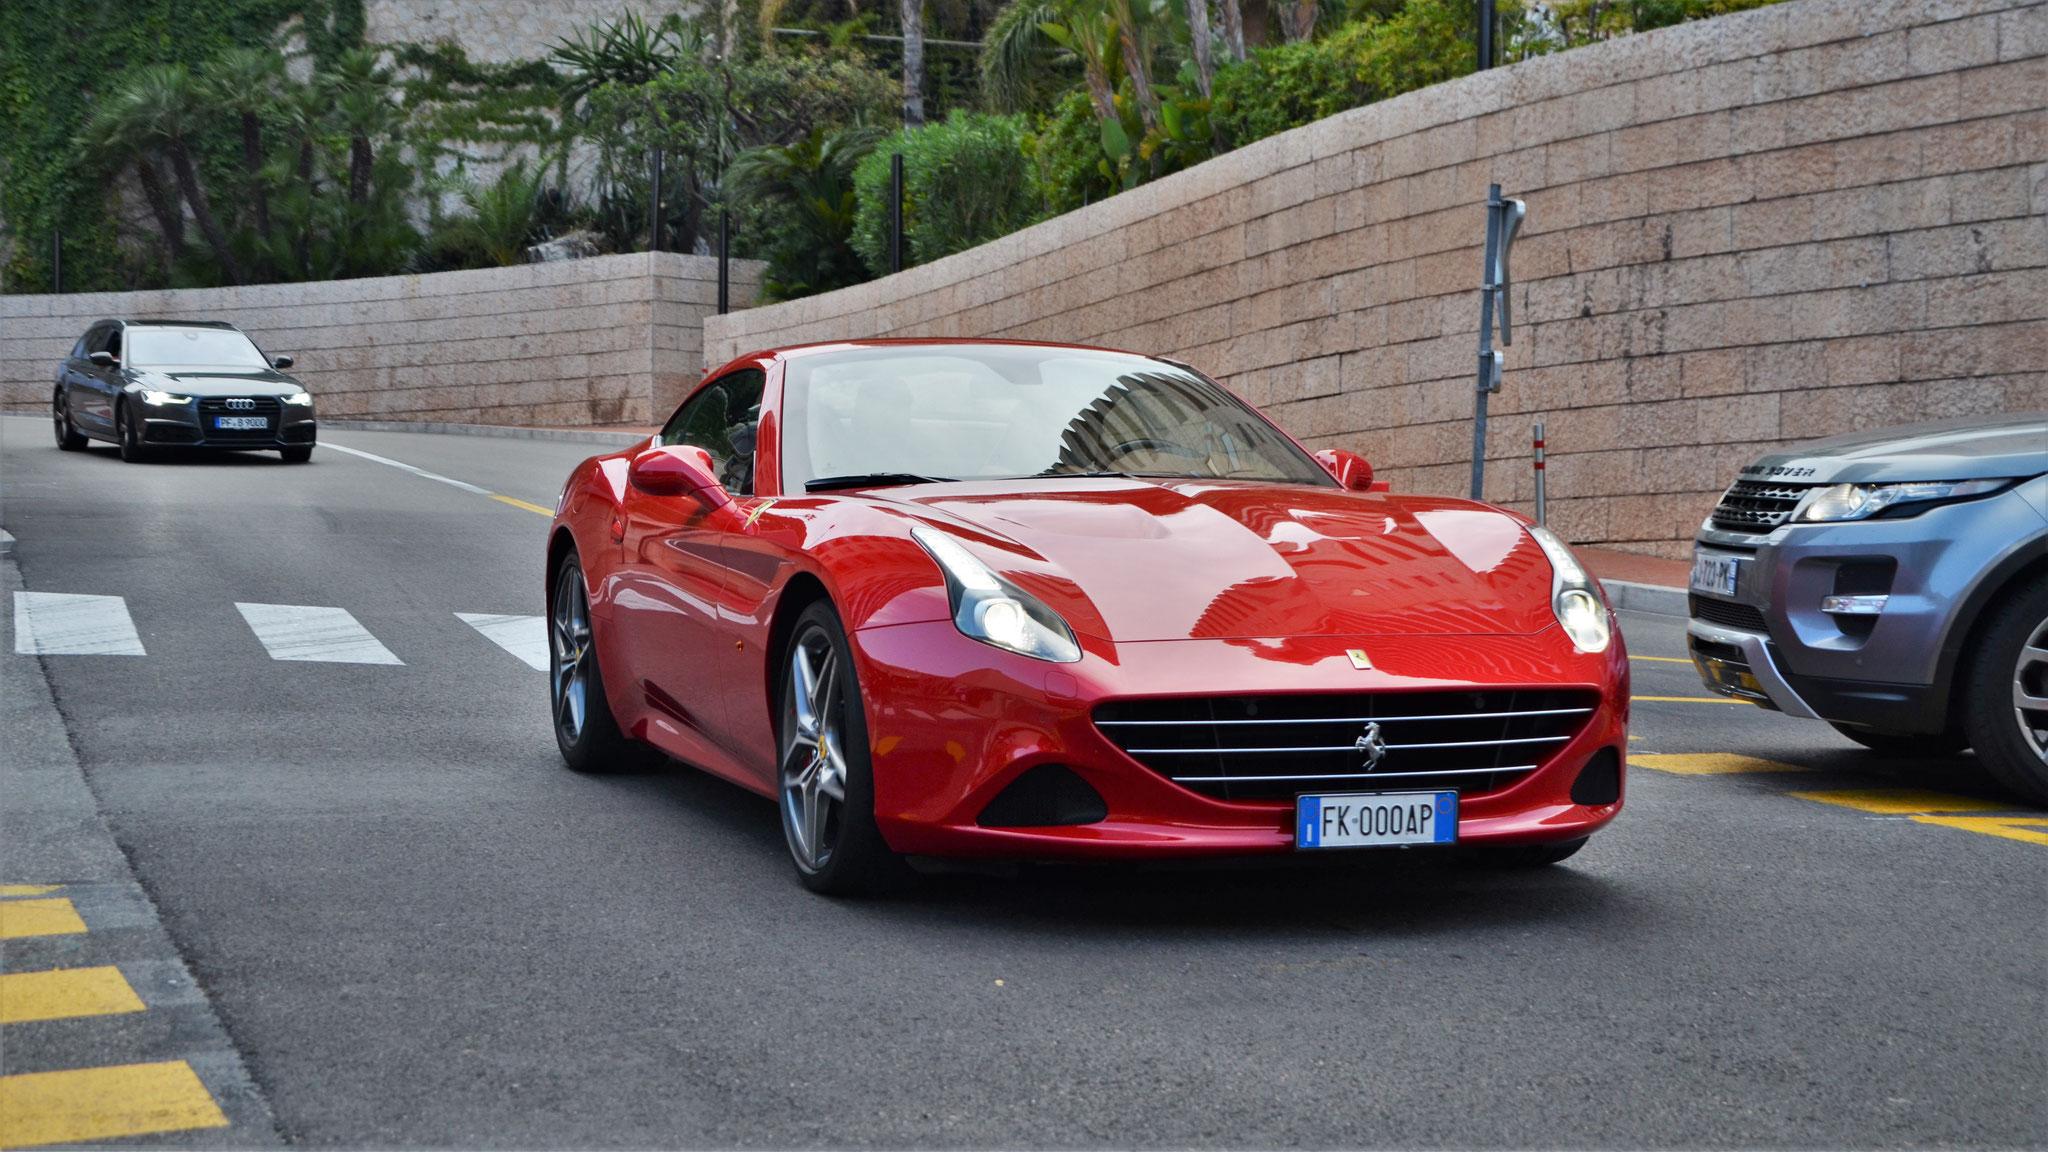 Ferrari California T - FK-000-AP (ITA)